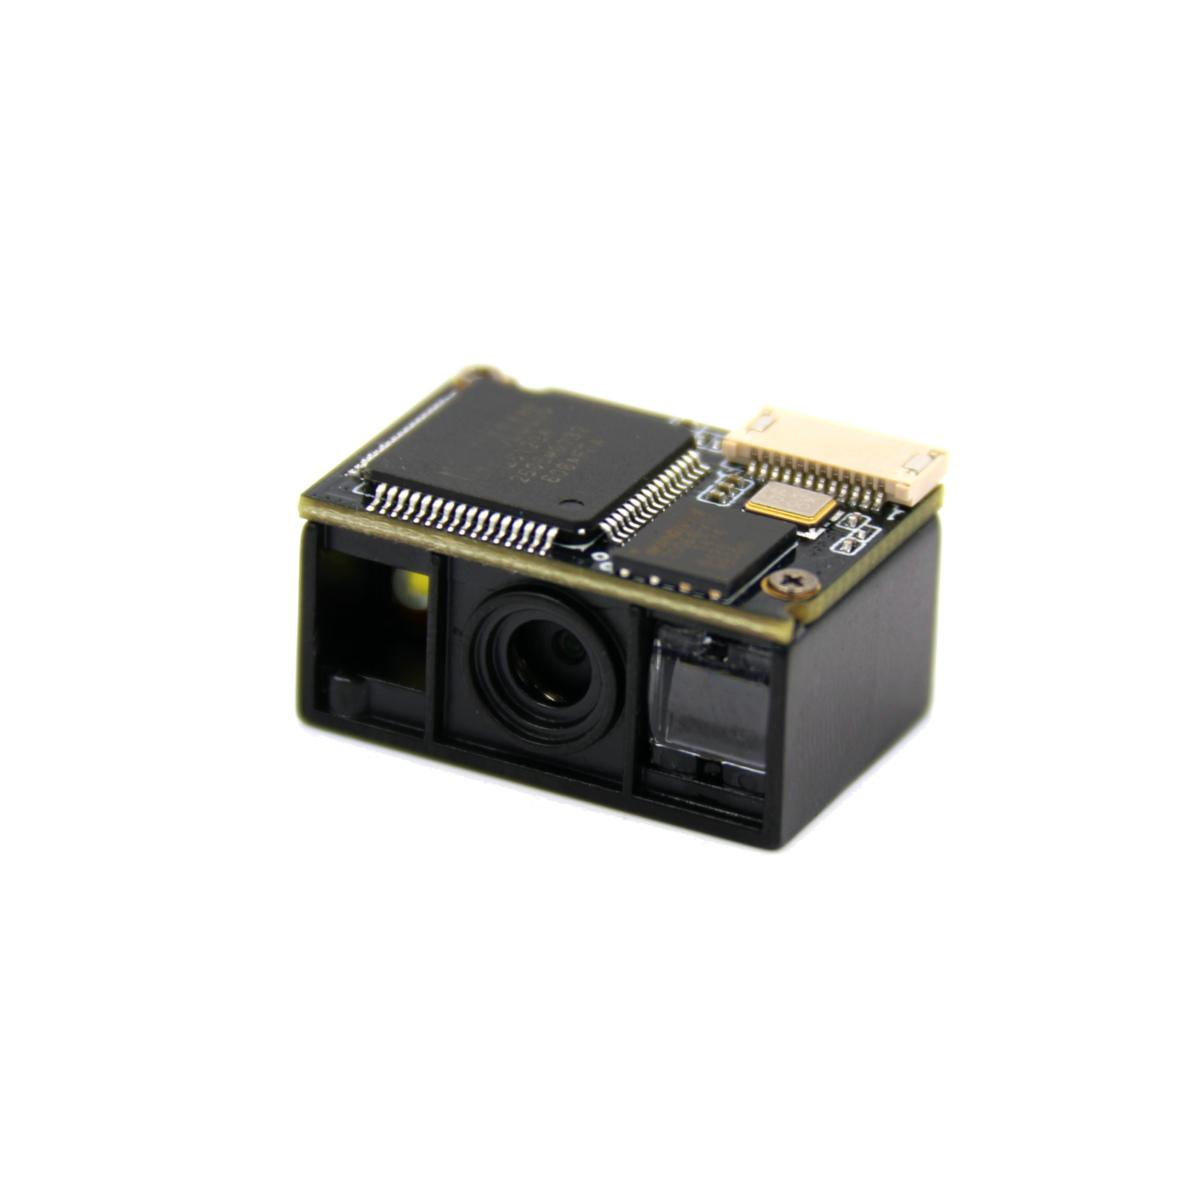 VM1830 嵌入式二维码扫描引擎